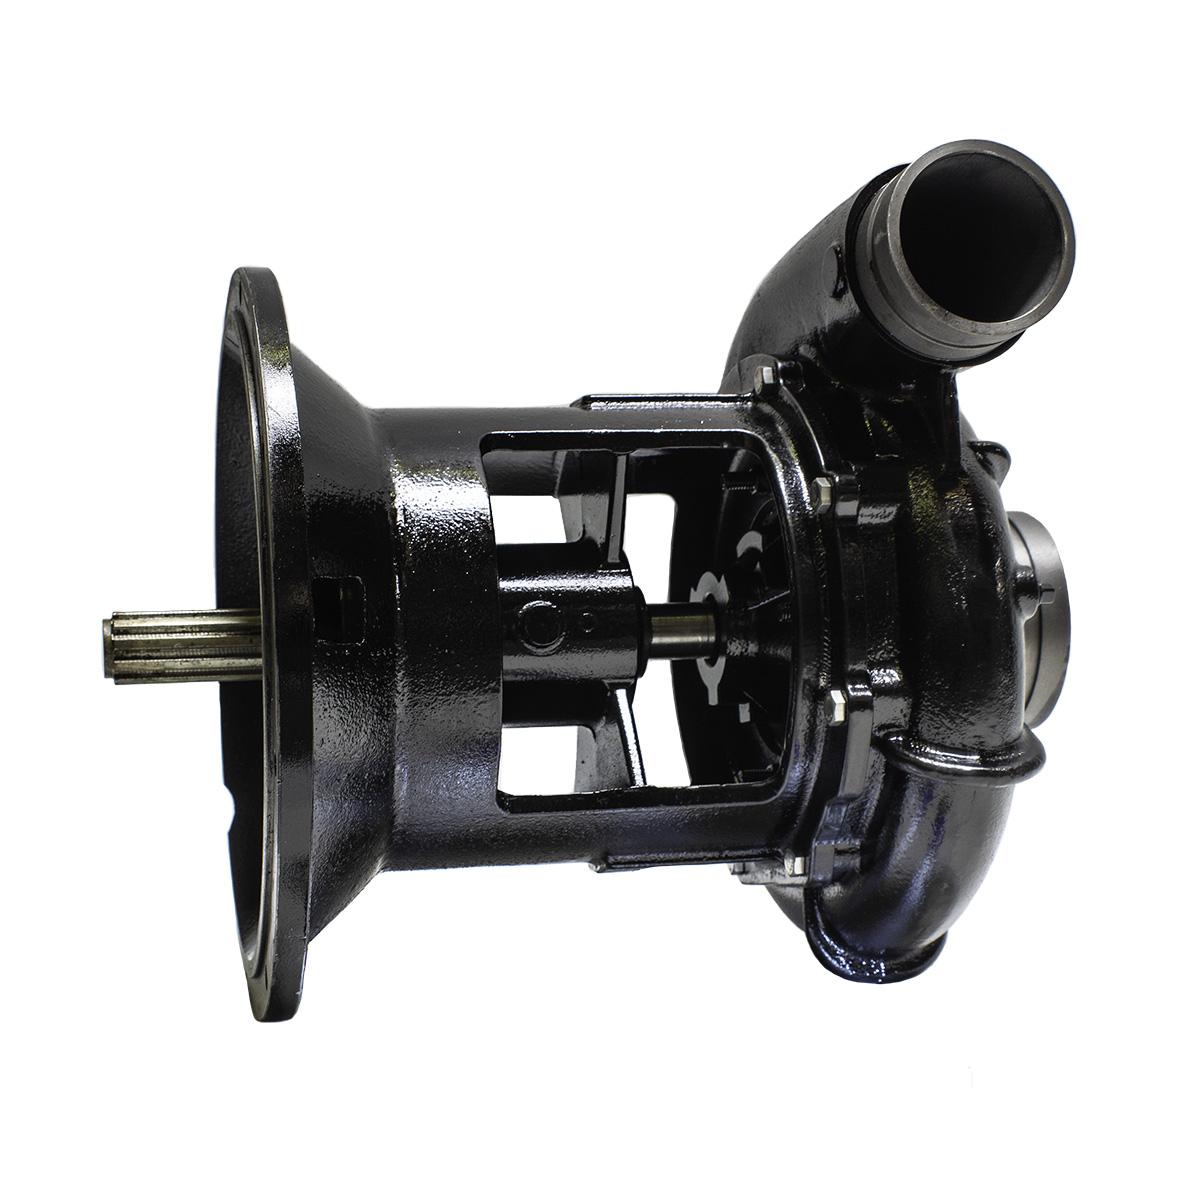 B3zq S Sae 5 Engine Mount Pump Cw Groove